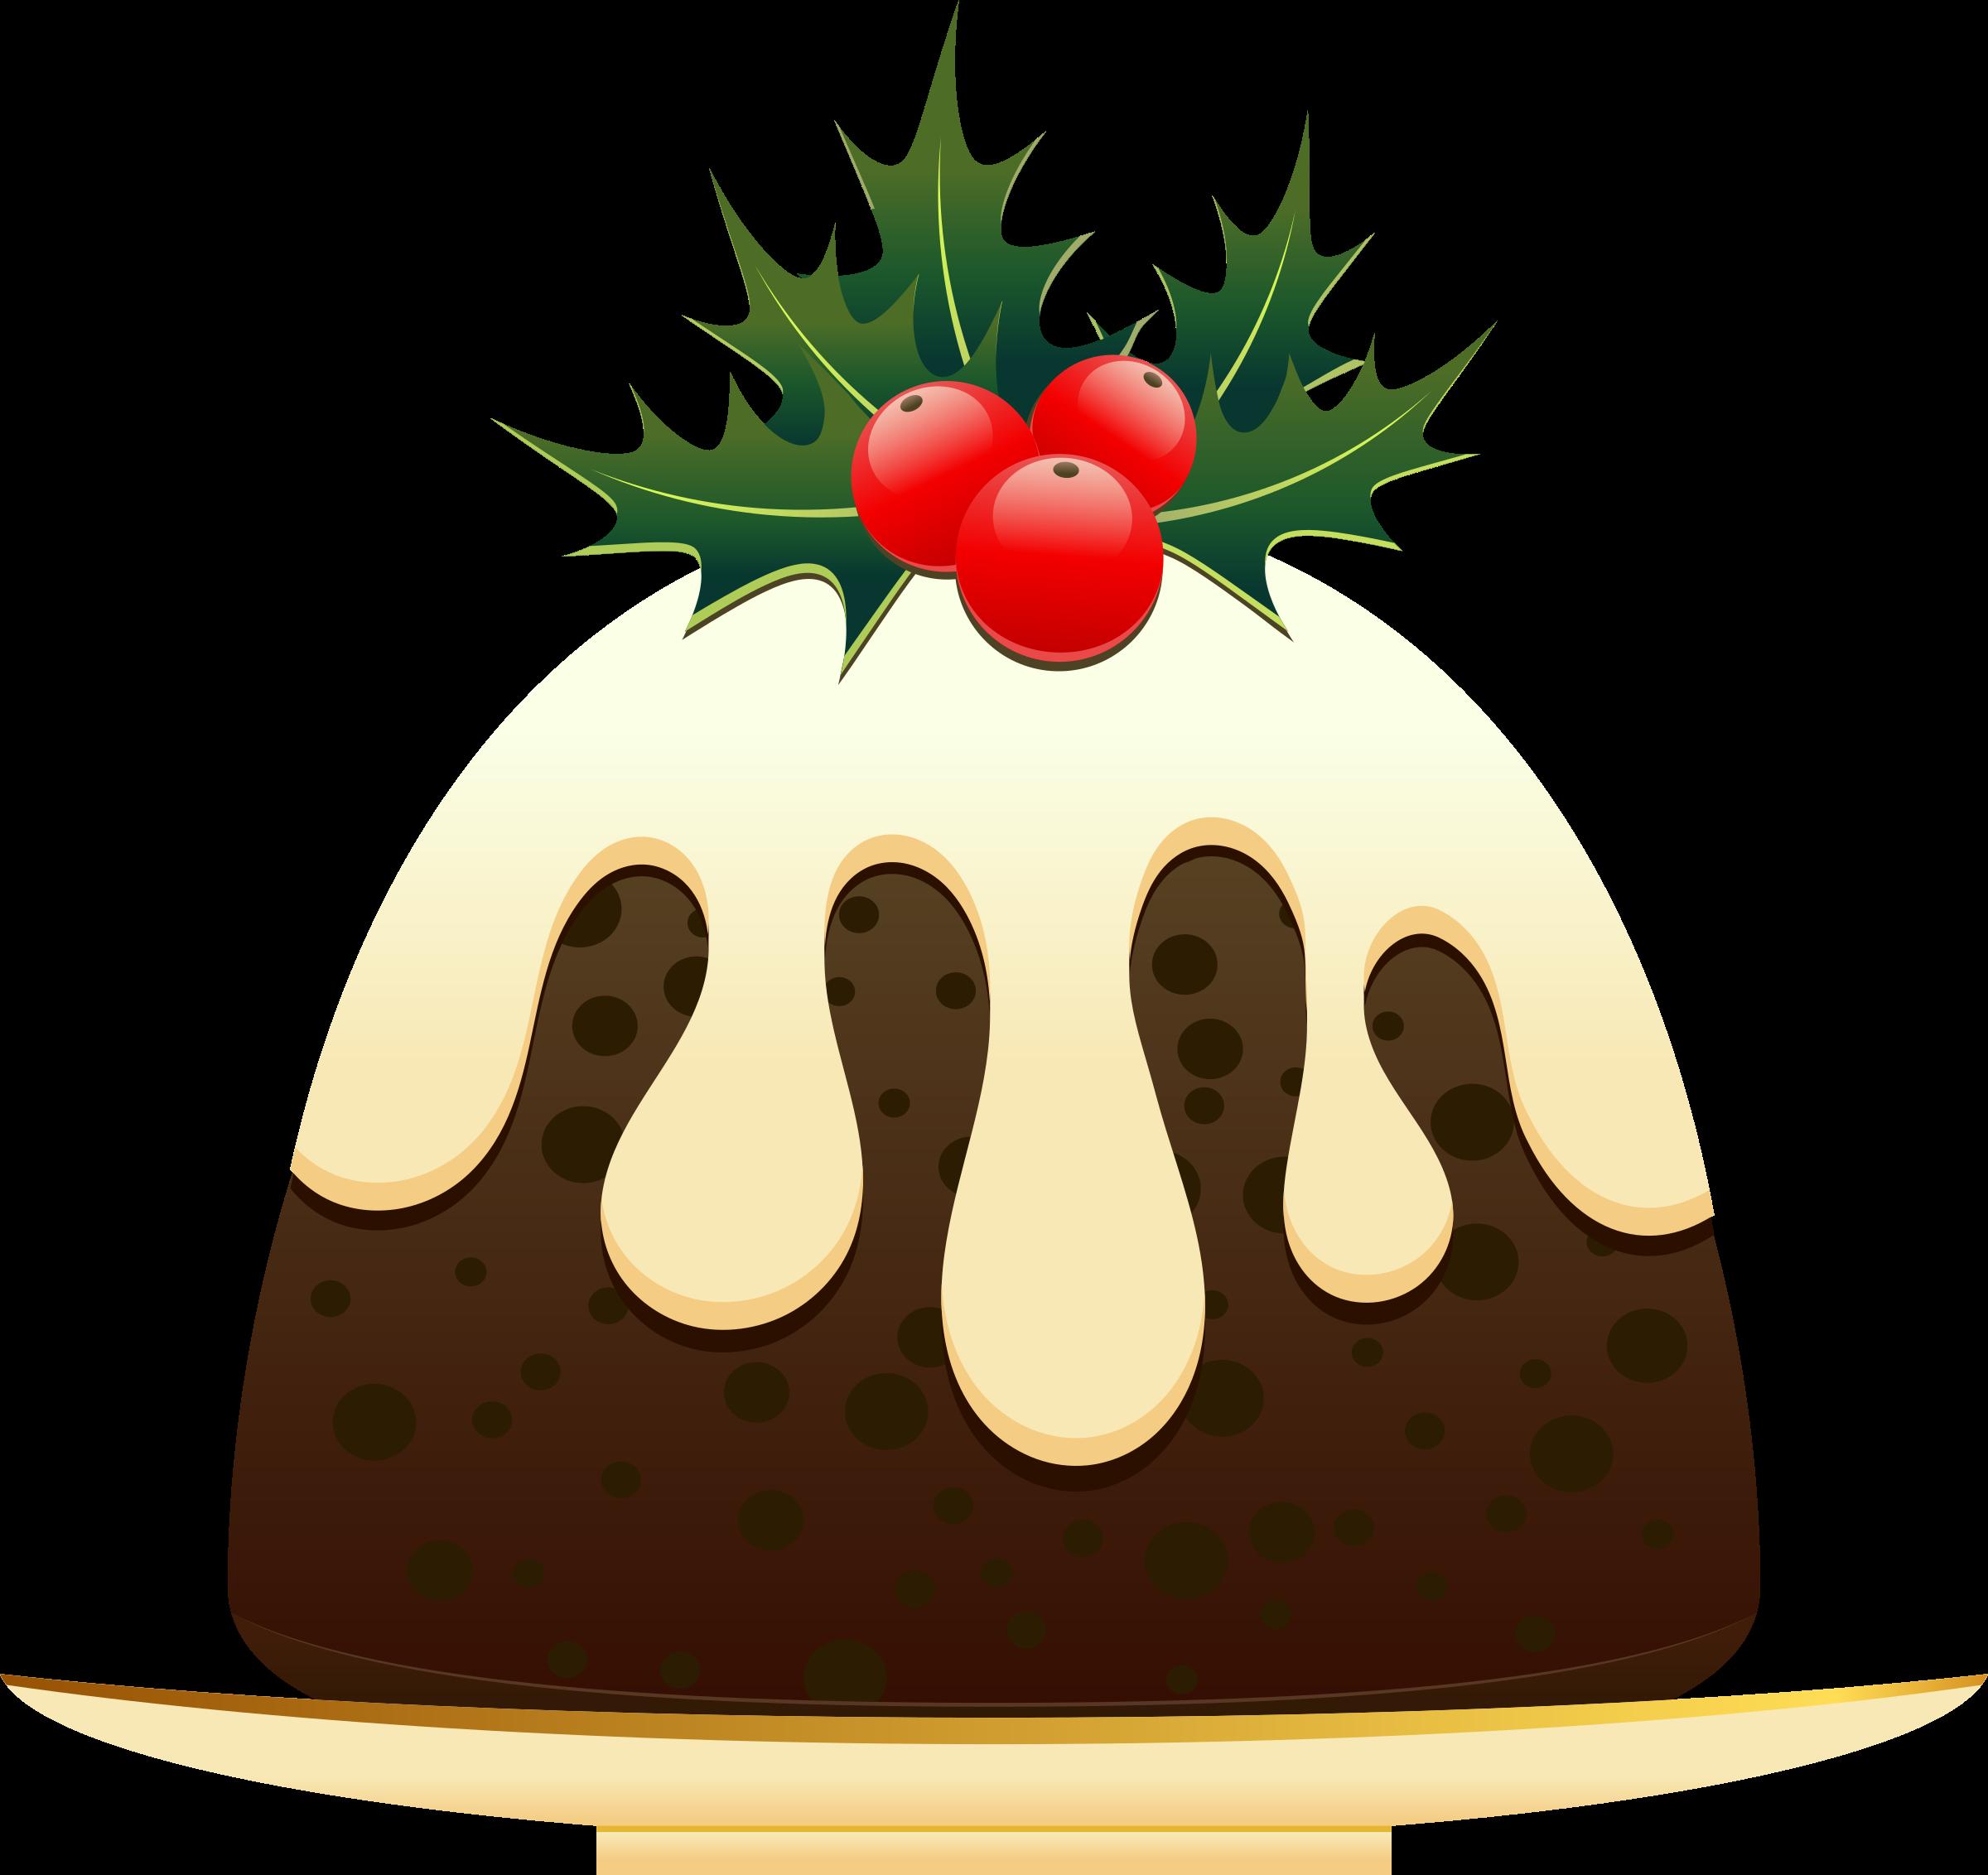 Christmas pudding. Poinsettia clipart animated